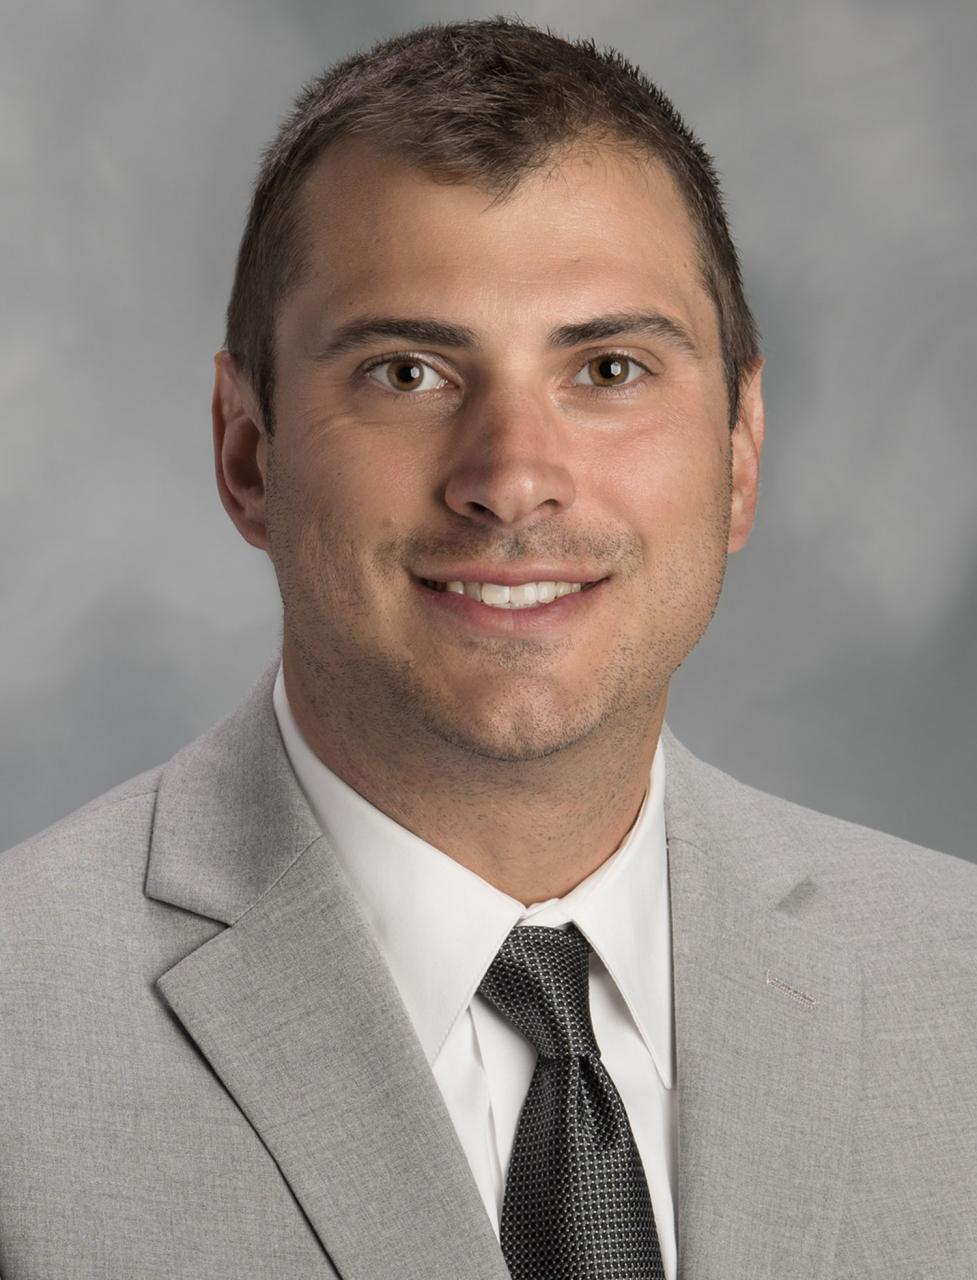 Ryan Catignani